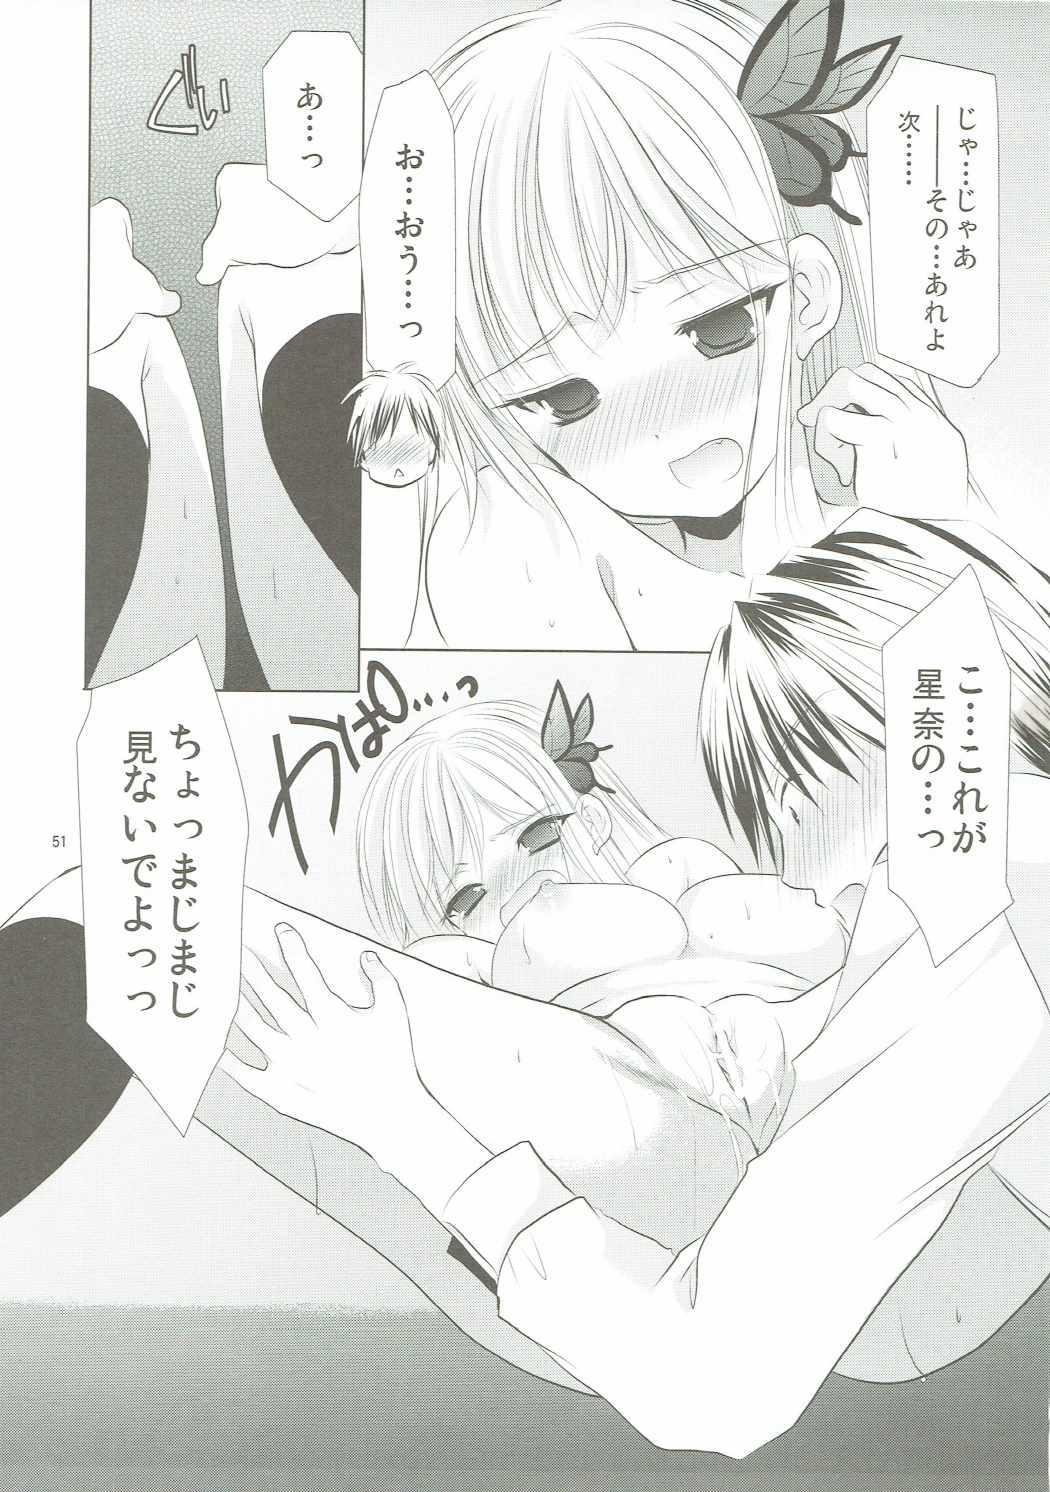 ANIME COLLECTION Imomuya Honpo - Singleton Anime Soushuuhen 49